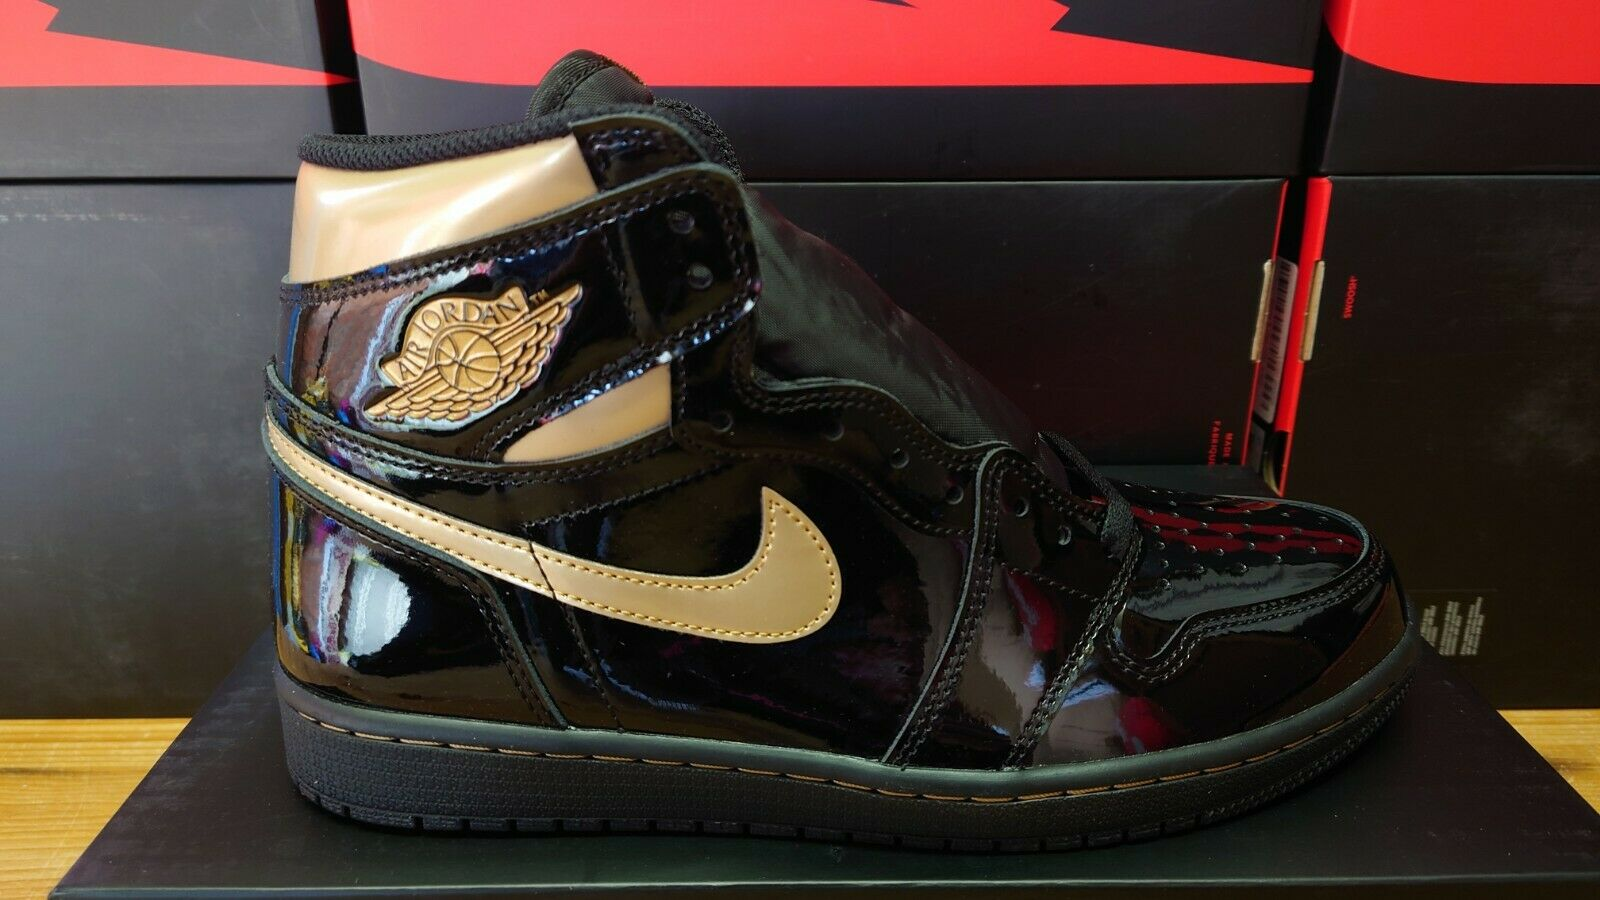 Nike Air Jordan 1 Black Metallic Gold Patent UK 8.5 USA 9.5 EU 43 555088 032